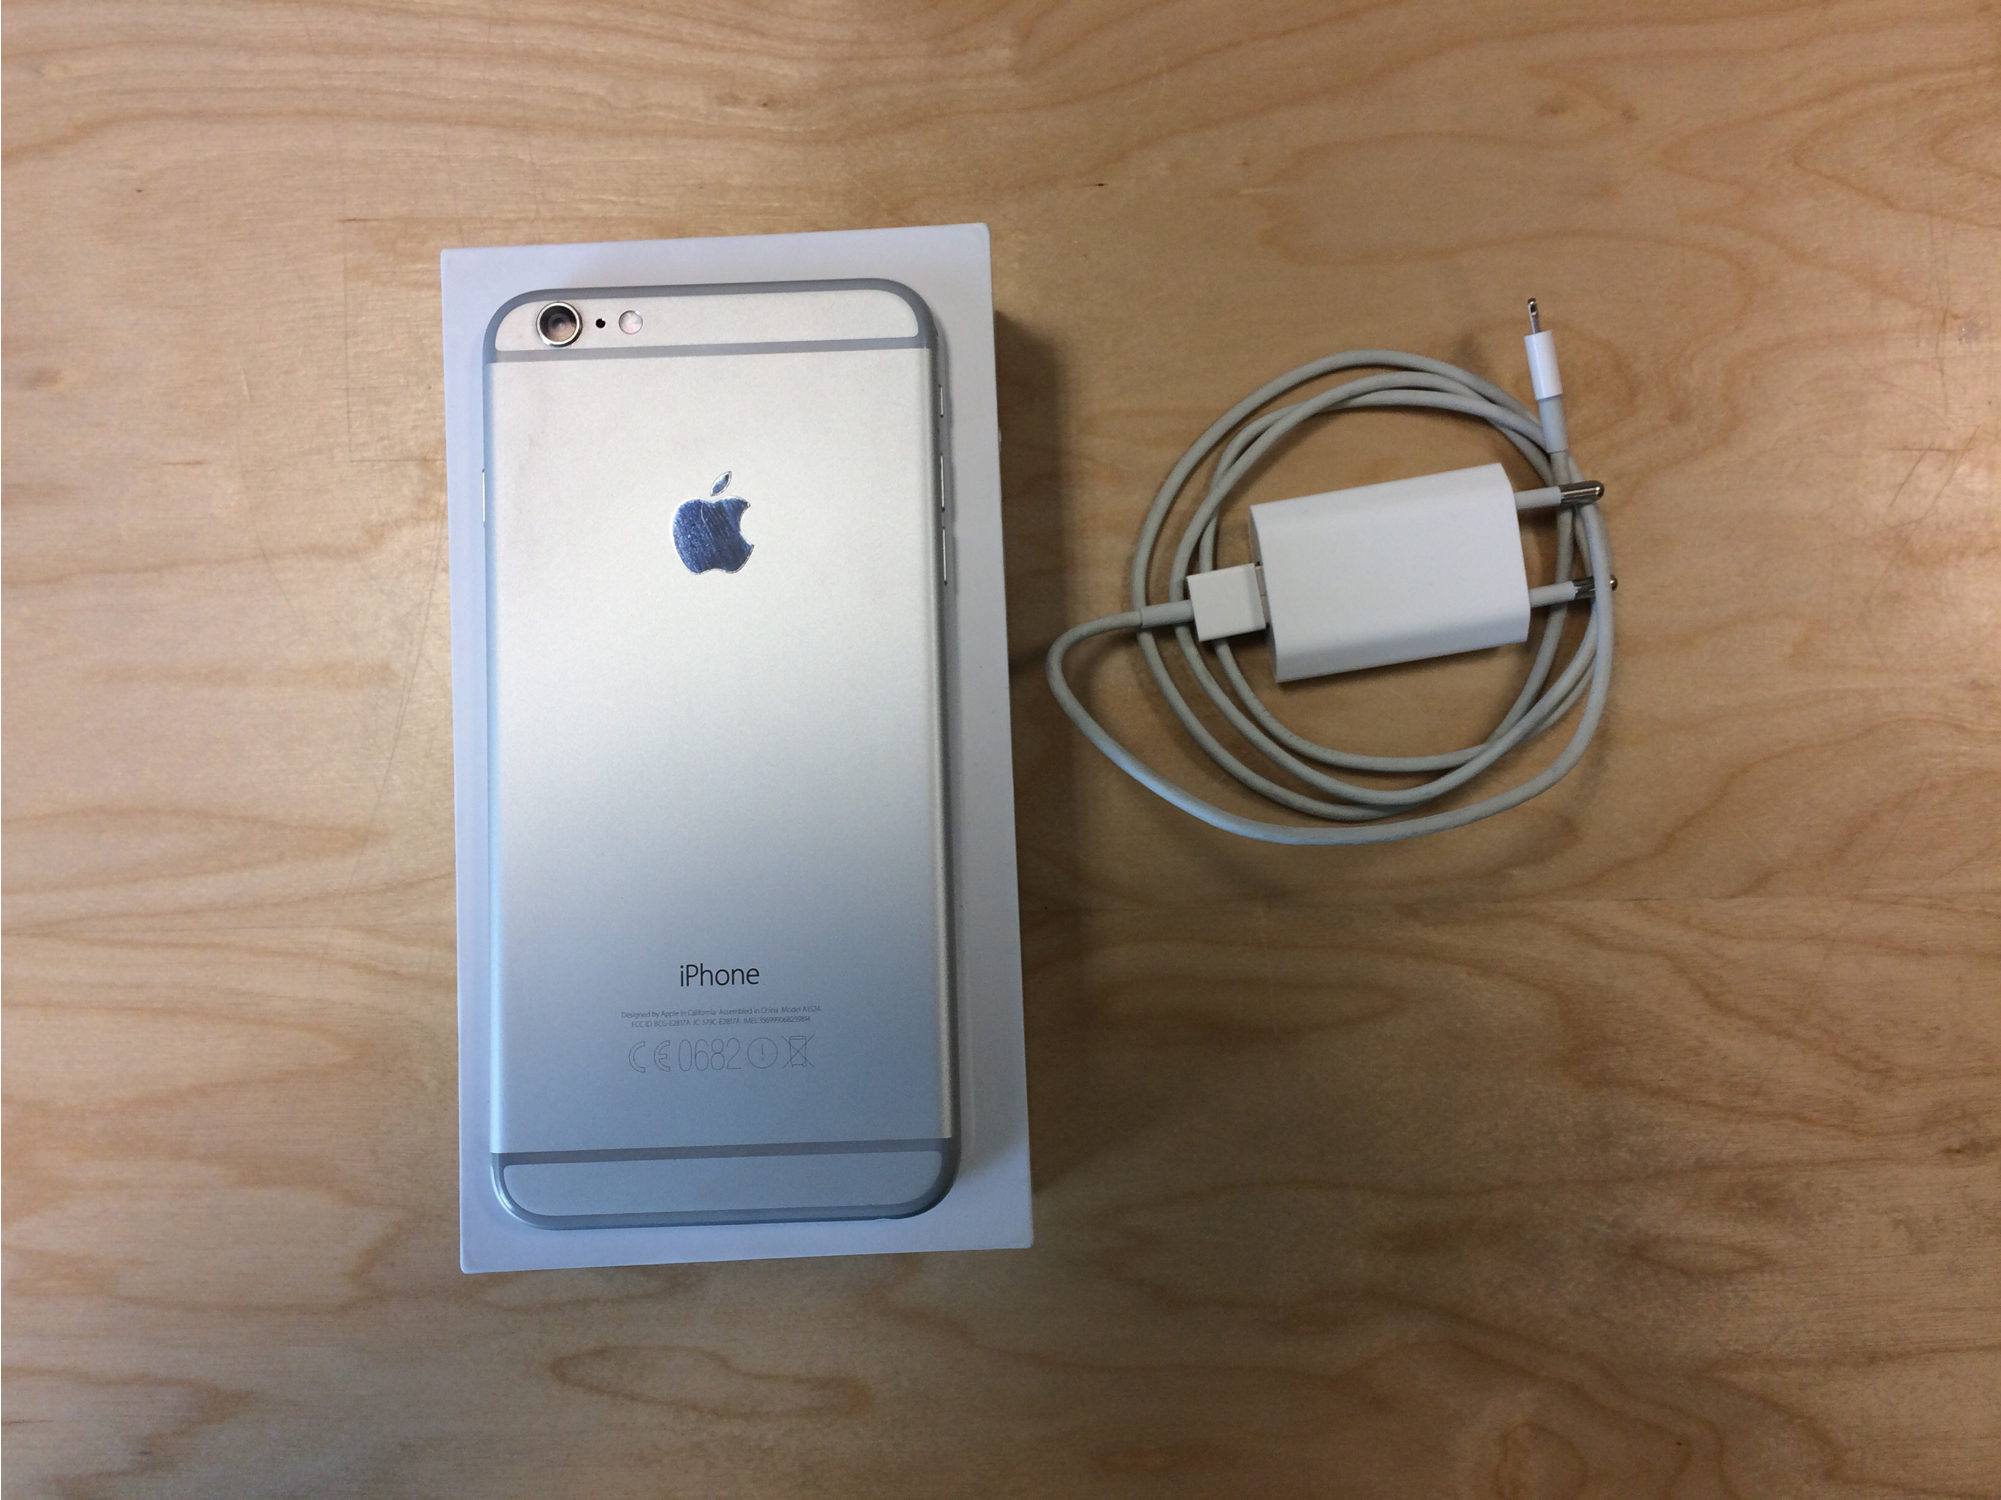 iPhone 6 Plus 64GB, 64GB, Silver, Afbeelding 3